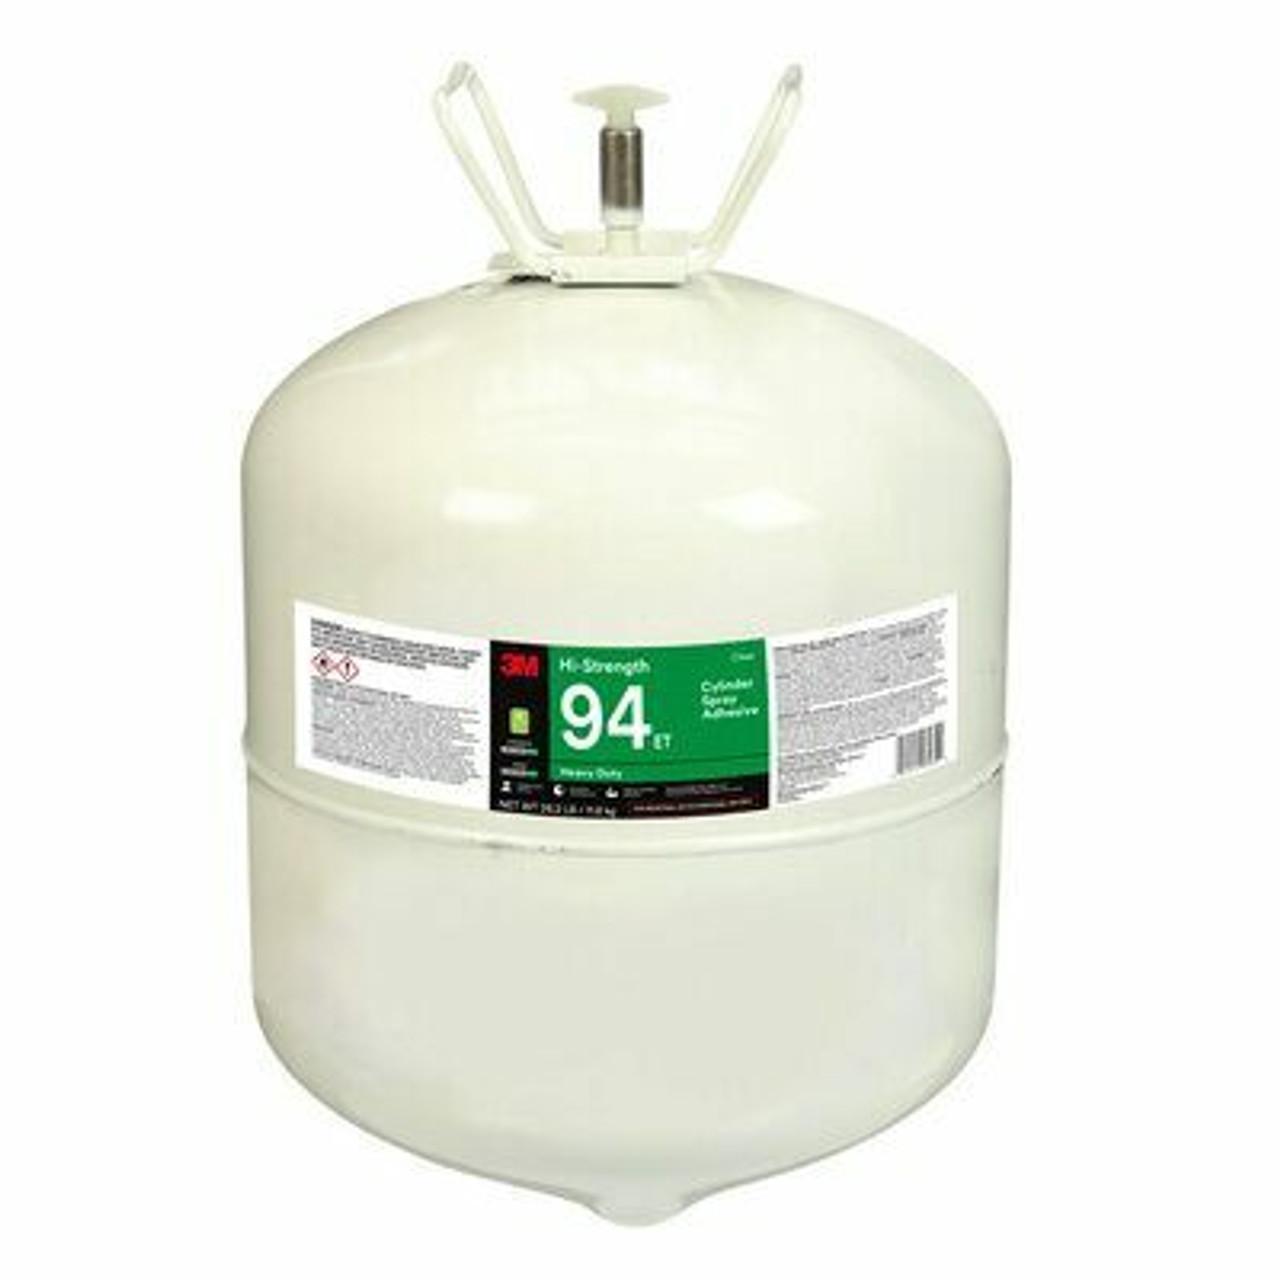 3M™ Hi-Strength 94 ET Cylinder Spray Adhesive, Red, Large Cylinder (Net Wt 26.2 lb)